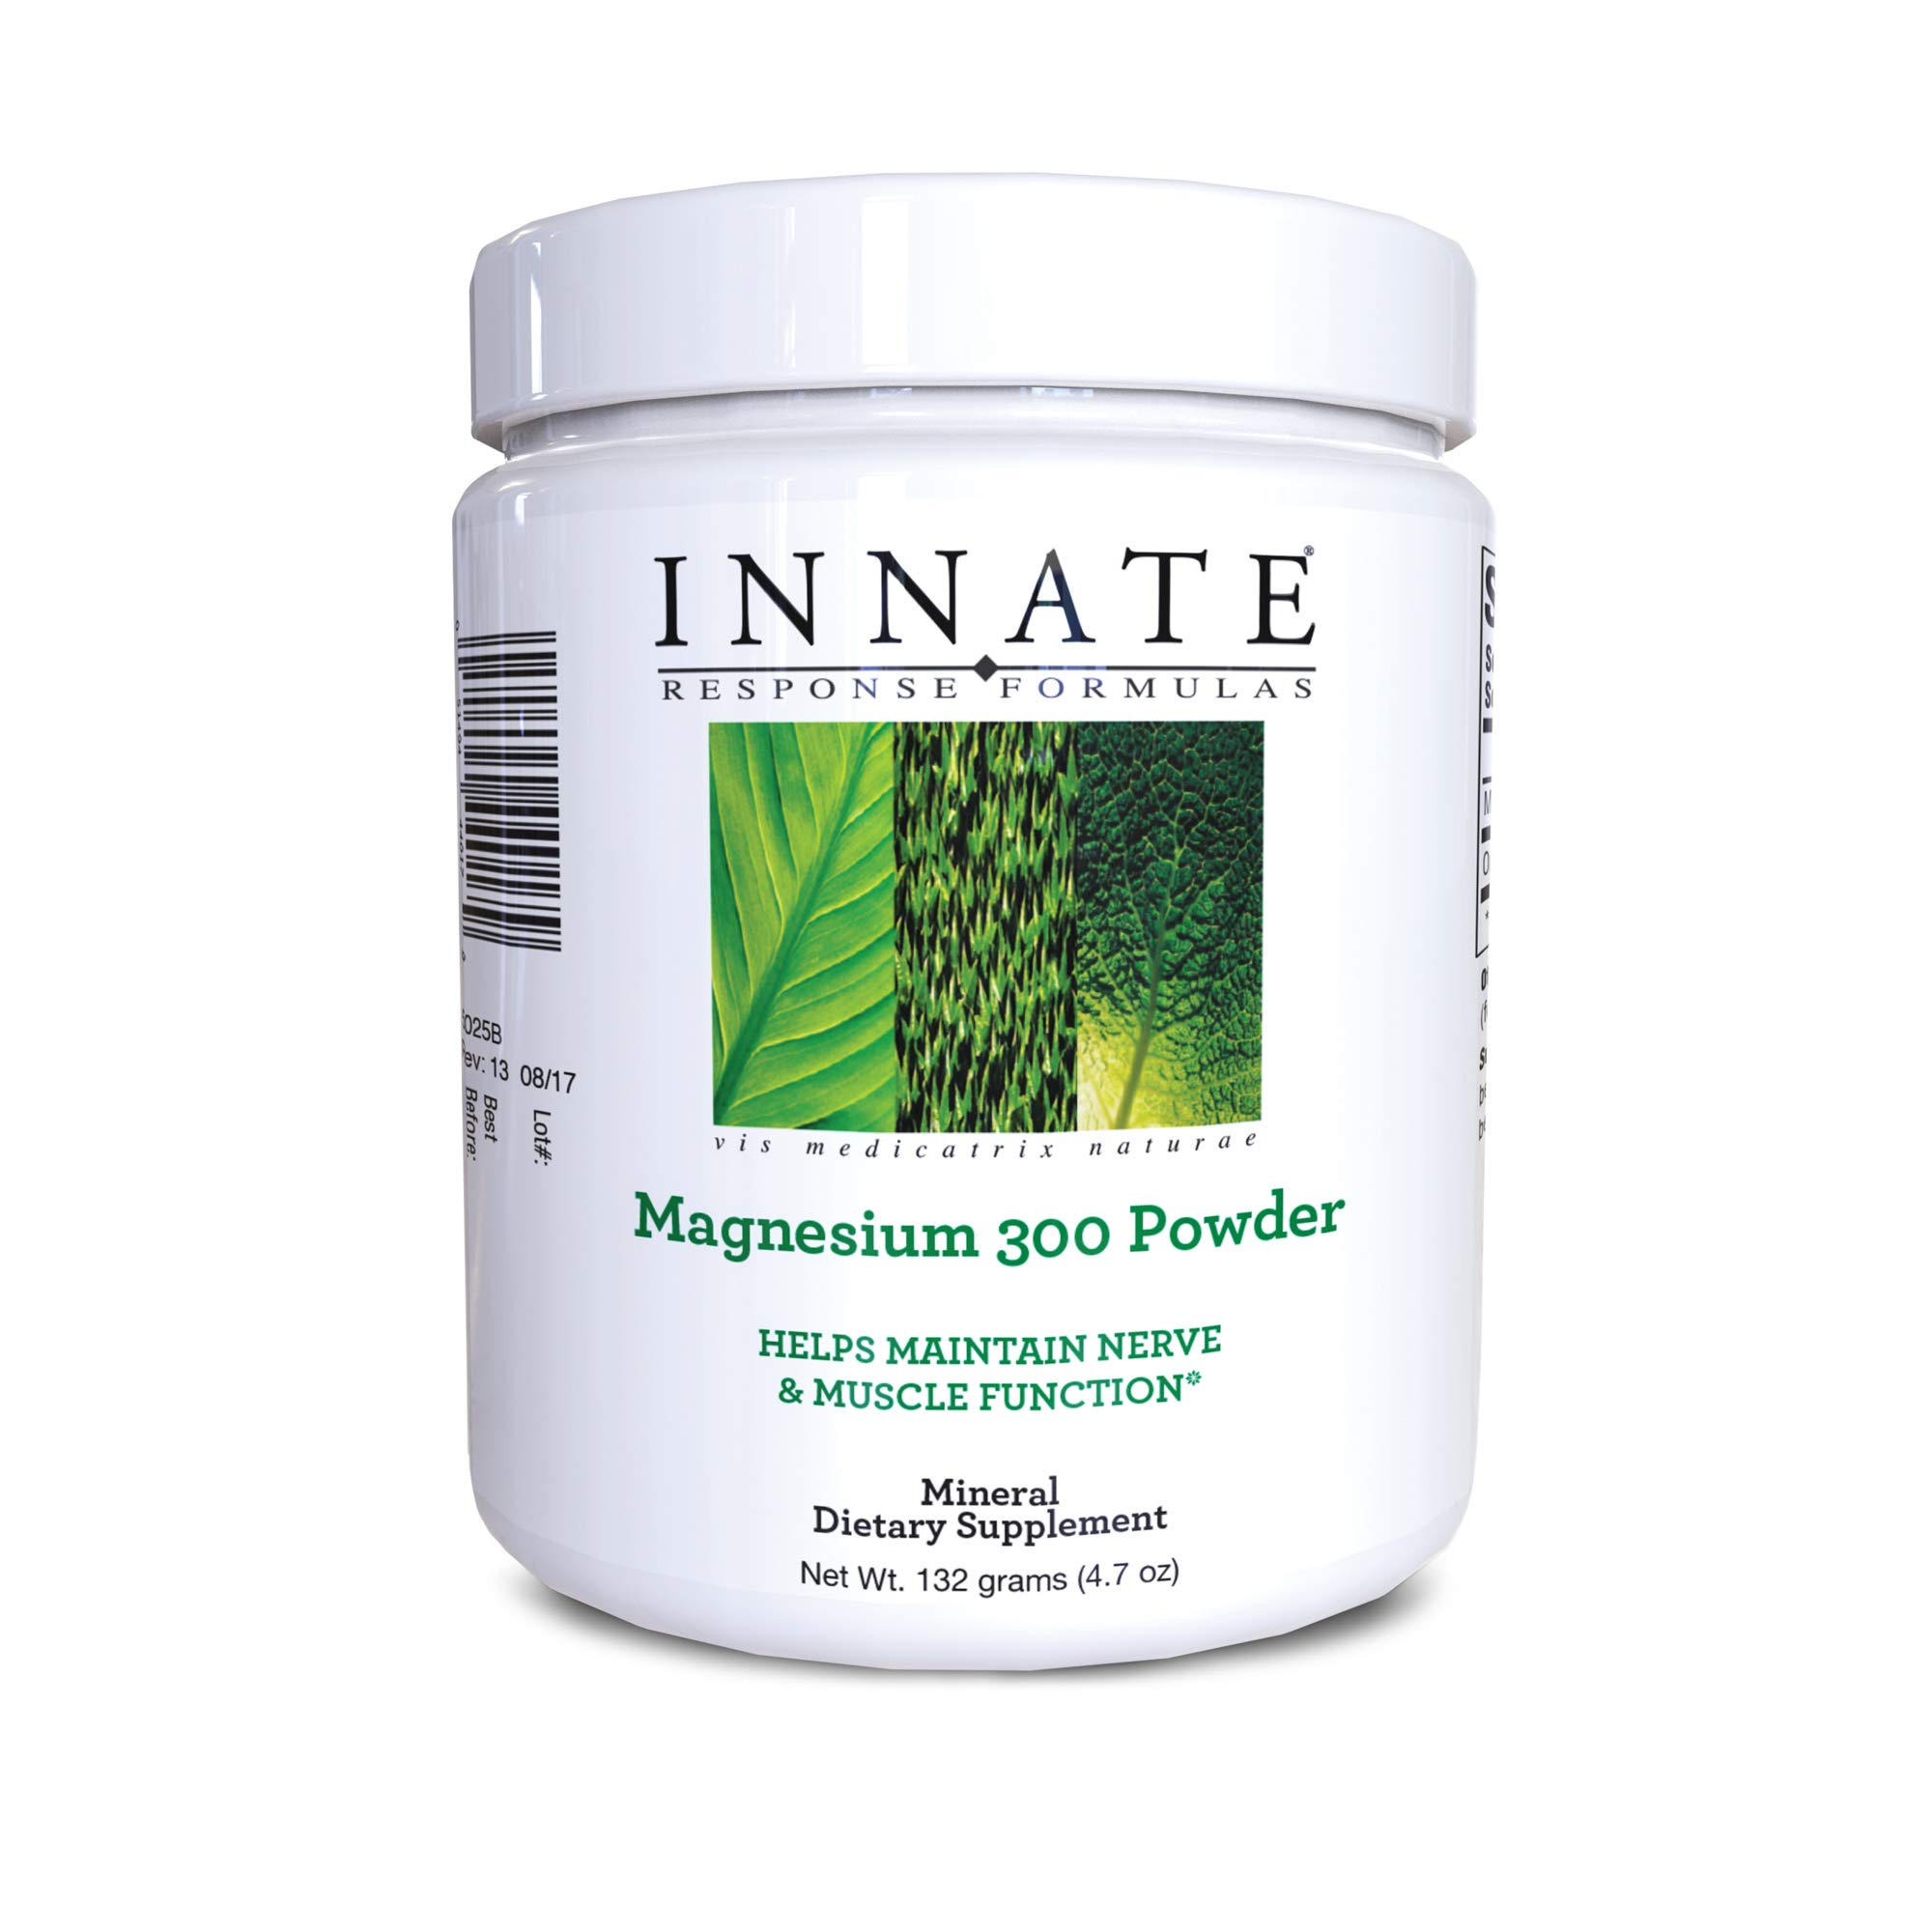 INNATE Response Formulas, Magnesium 300 Powder, Mineral Supplement, Vegetarian, 4.7 oz (60 servings)